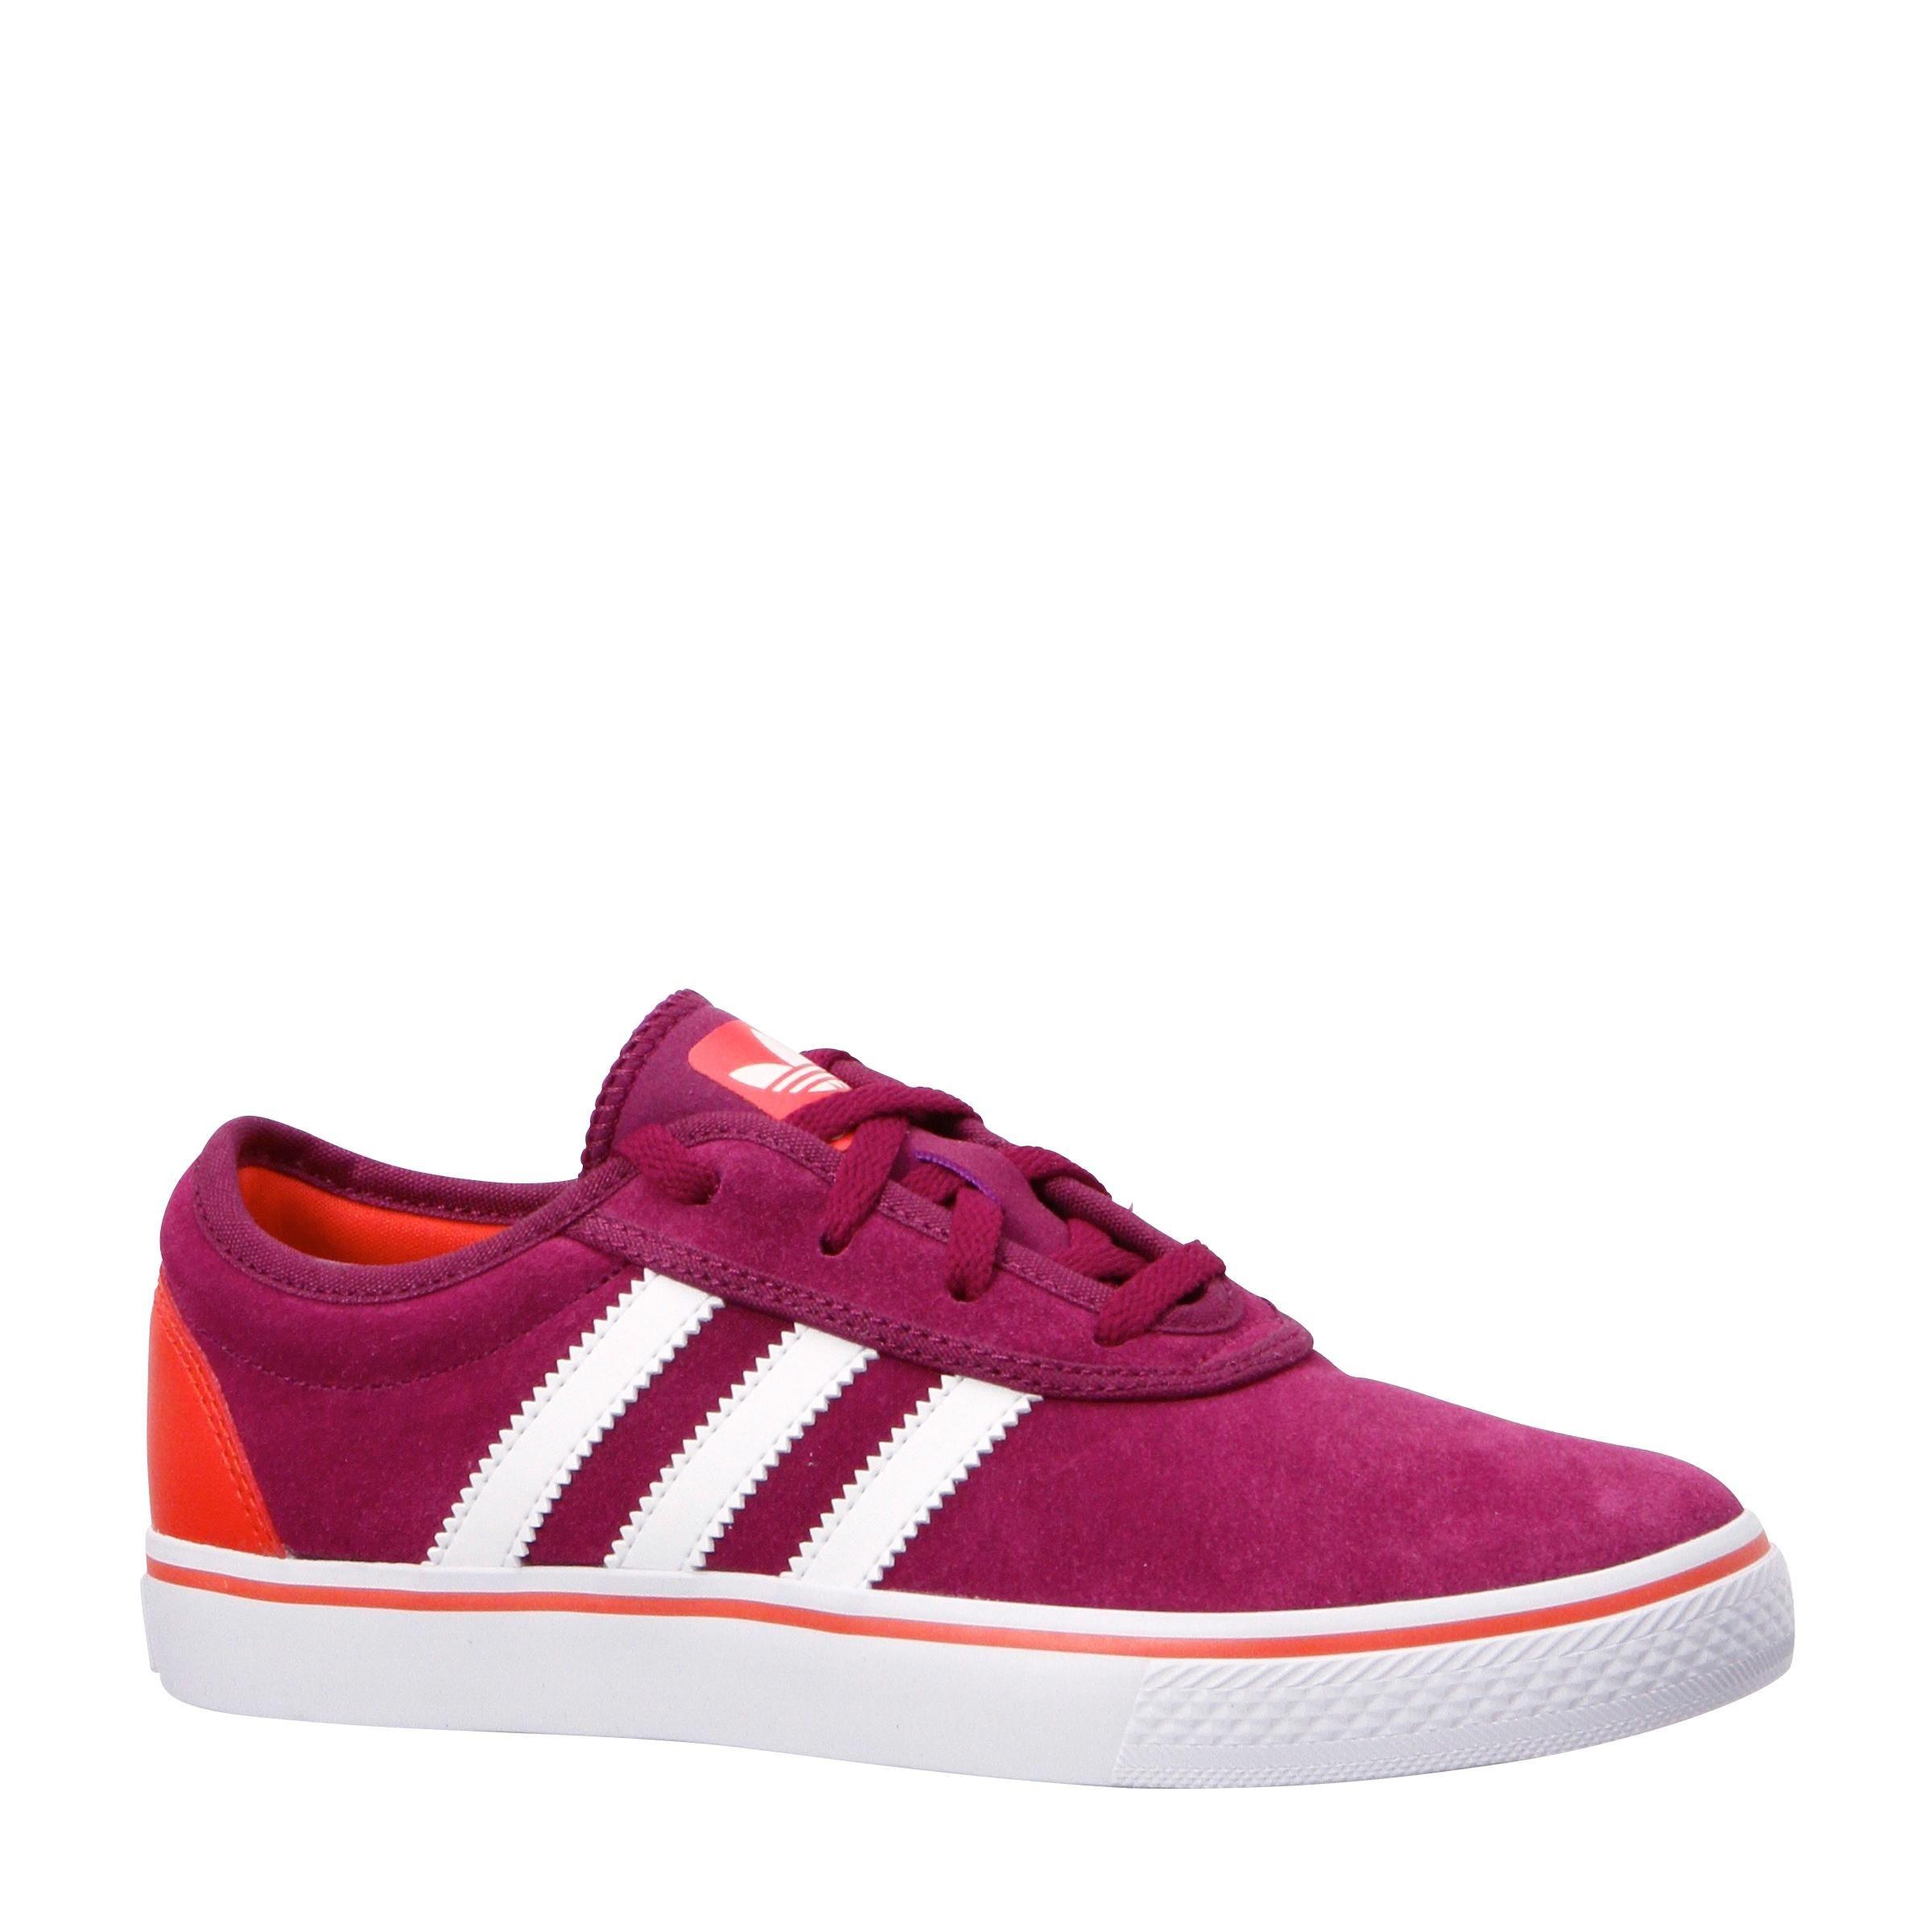 Hippe Adidas originals Sneakers Adi Ease (Paars/wit) Sneakers van het merk adidas originals voor Meisjes . Uitgevoerd in Paars/wit gemaakt van Suede rubber.